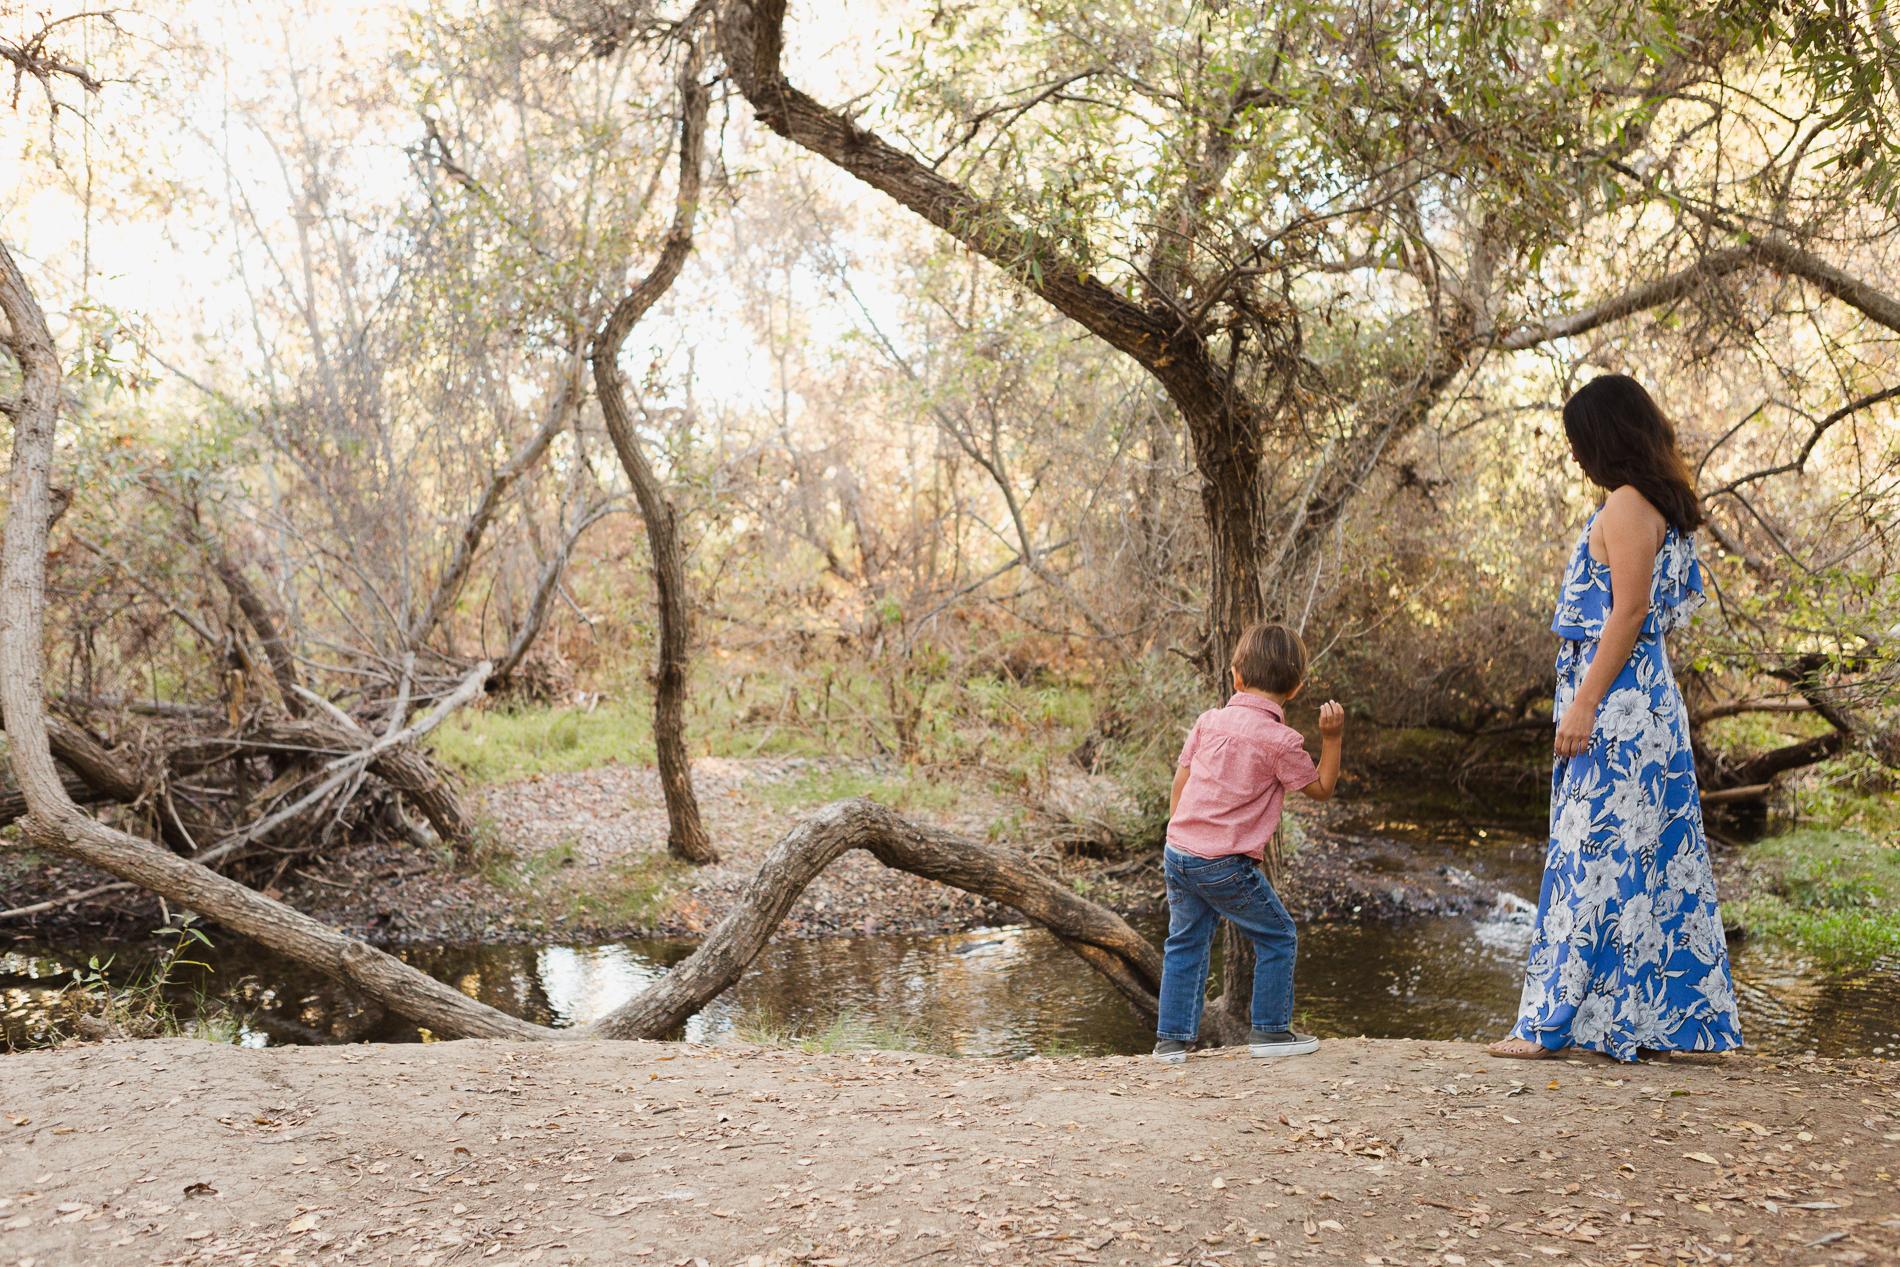 San Diego Family Photographer Los Penasquitos Canyon Christine Dammann Photography-20.jpg